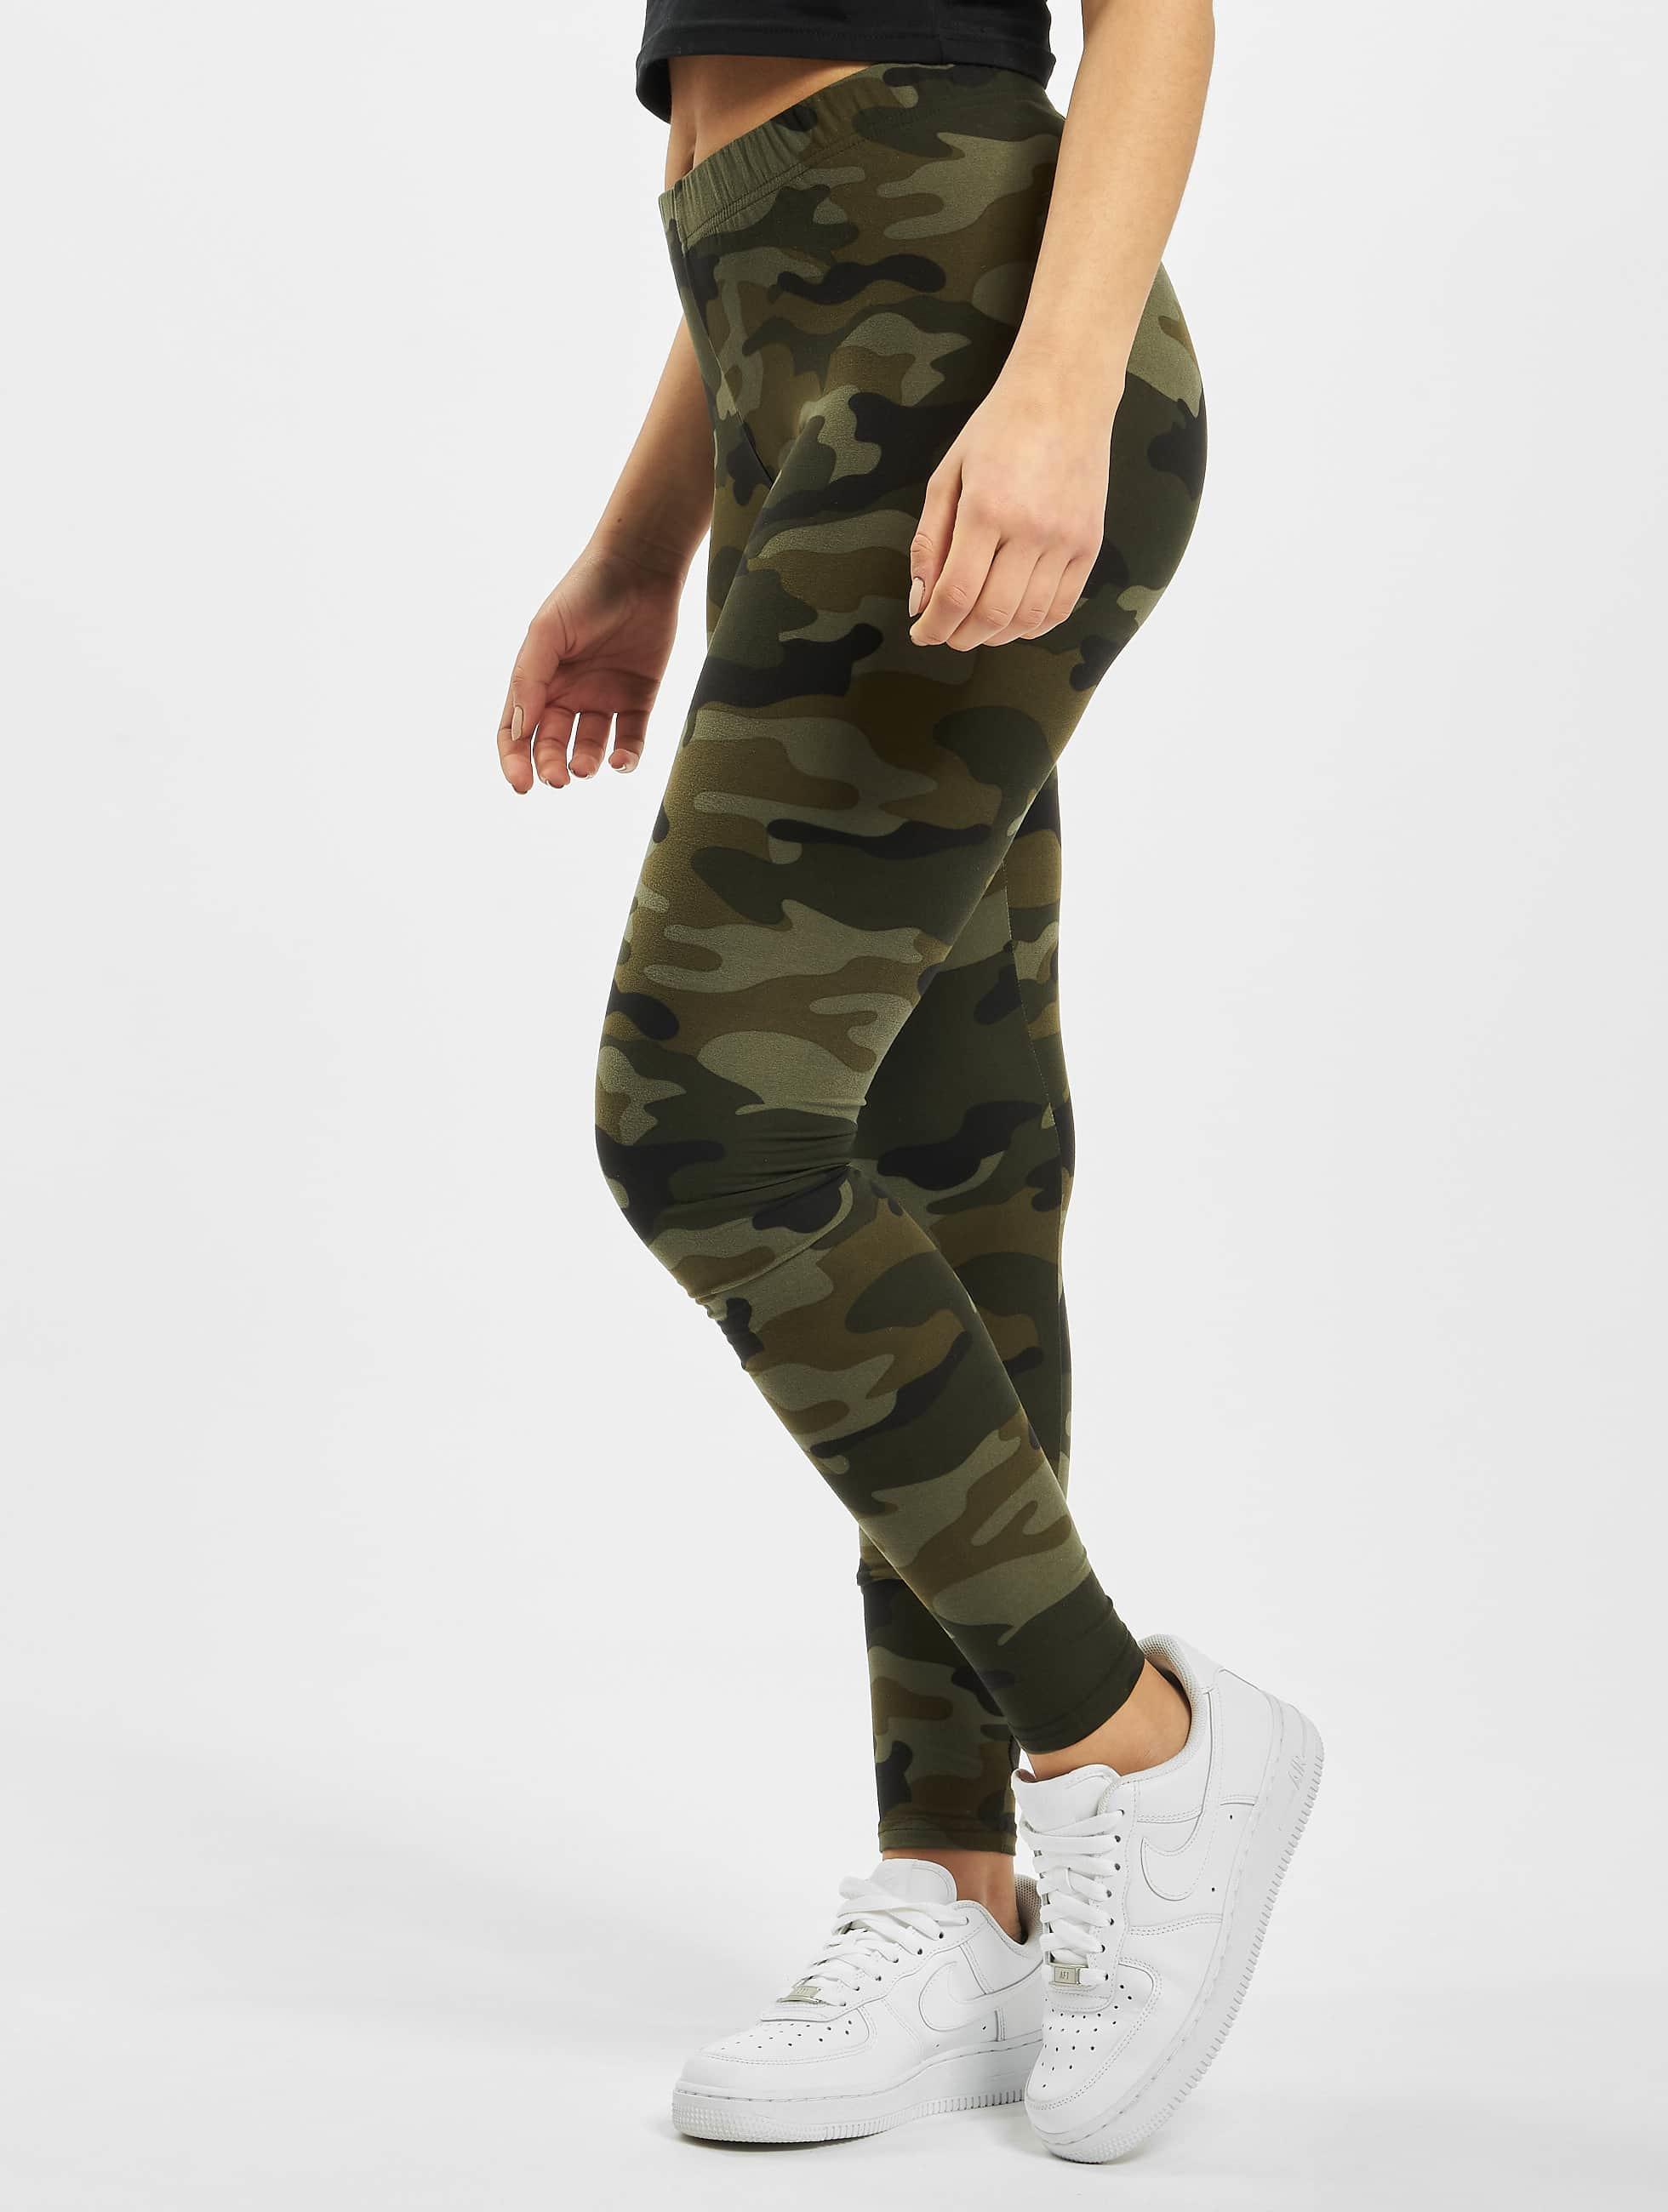 Legging Camo in camouflage